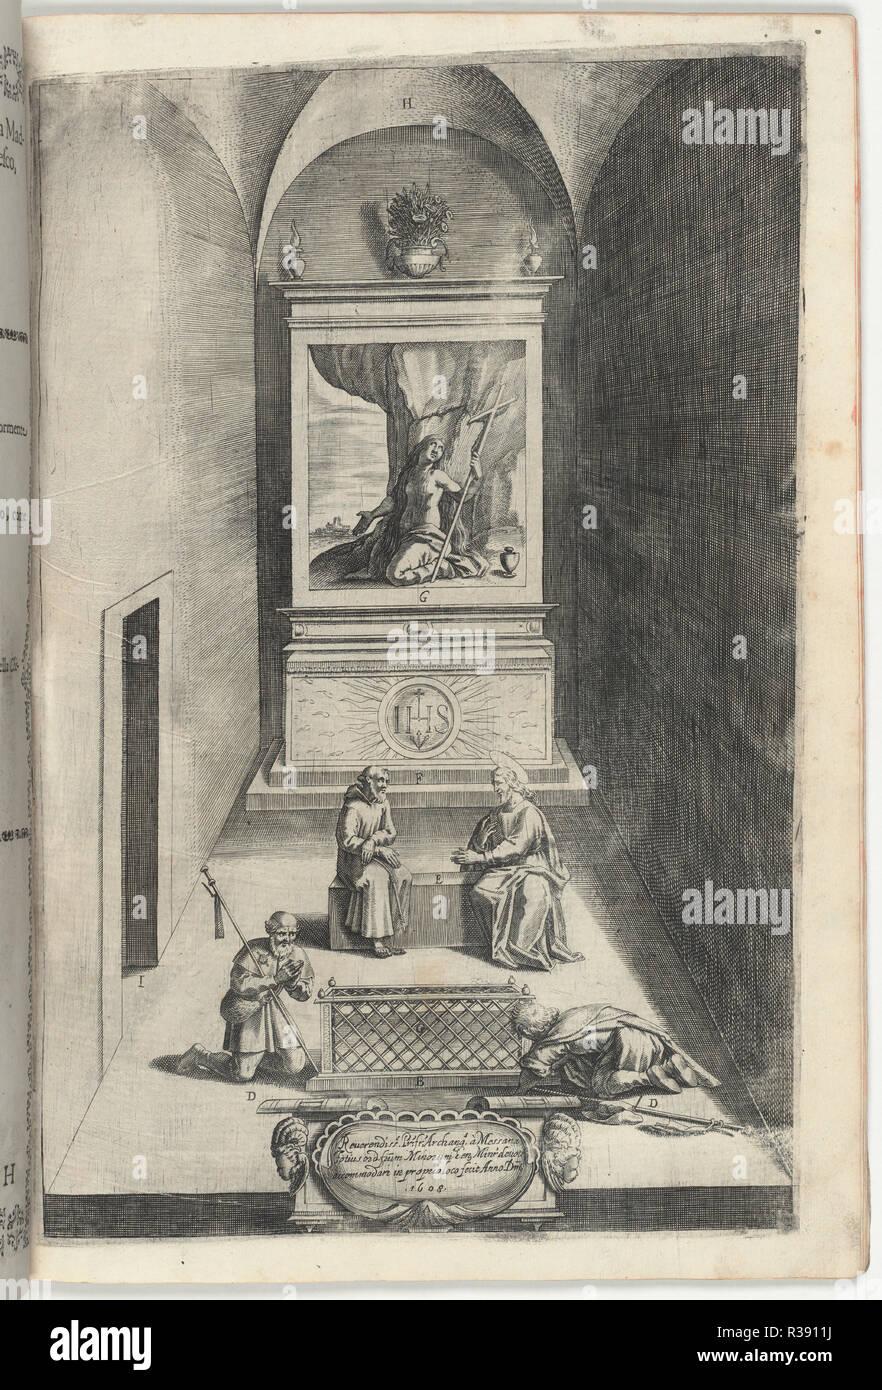 Interior of the Chapel of Mary Magdelene (Interno della cappella della Maddalena). Dated: 1612. Dimensions: book: 43.3 × 30 × 1.8 cm (17 1/16 × 11 13/16 × 11/16 in.). Medium: 1 engraved illusration. Museum: National Gallery of Art, Washington DC. Author: Lino Moroni. - Stock Image